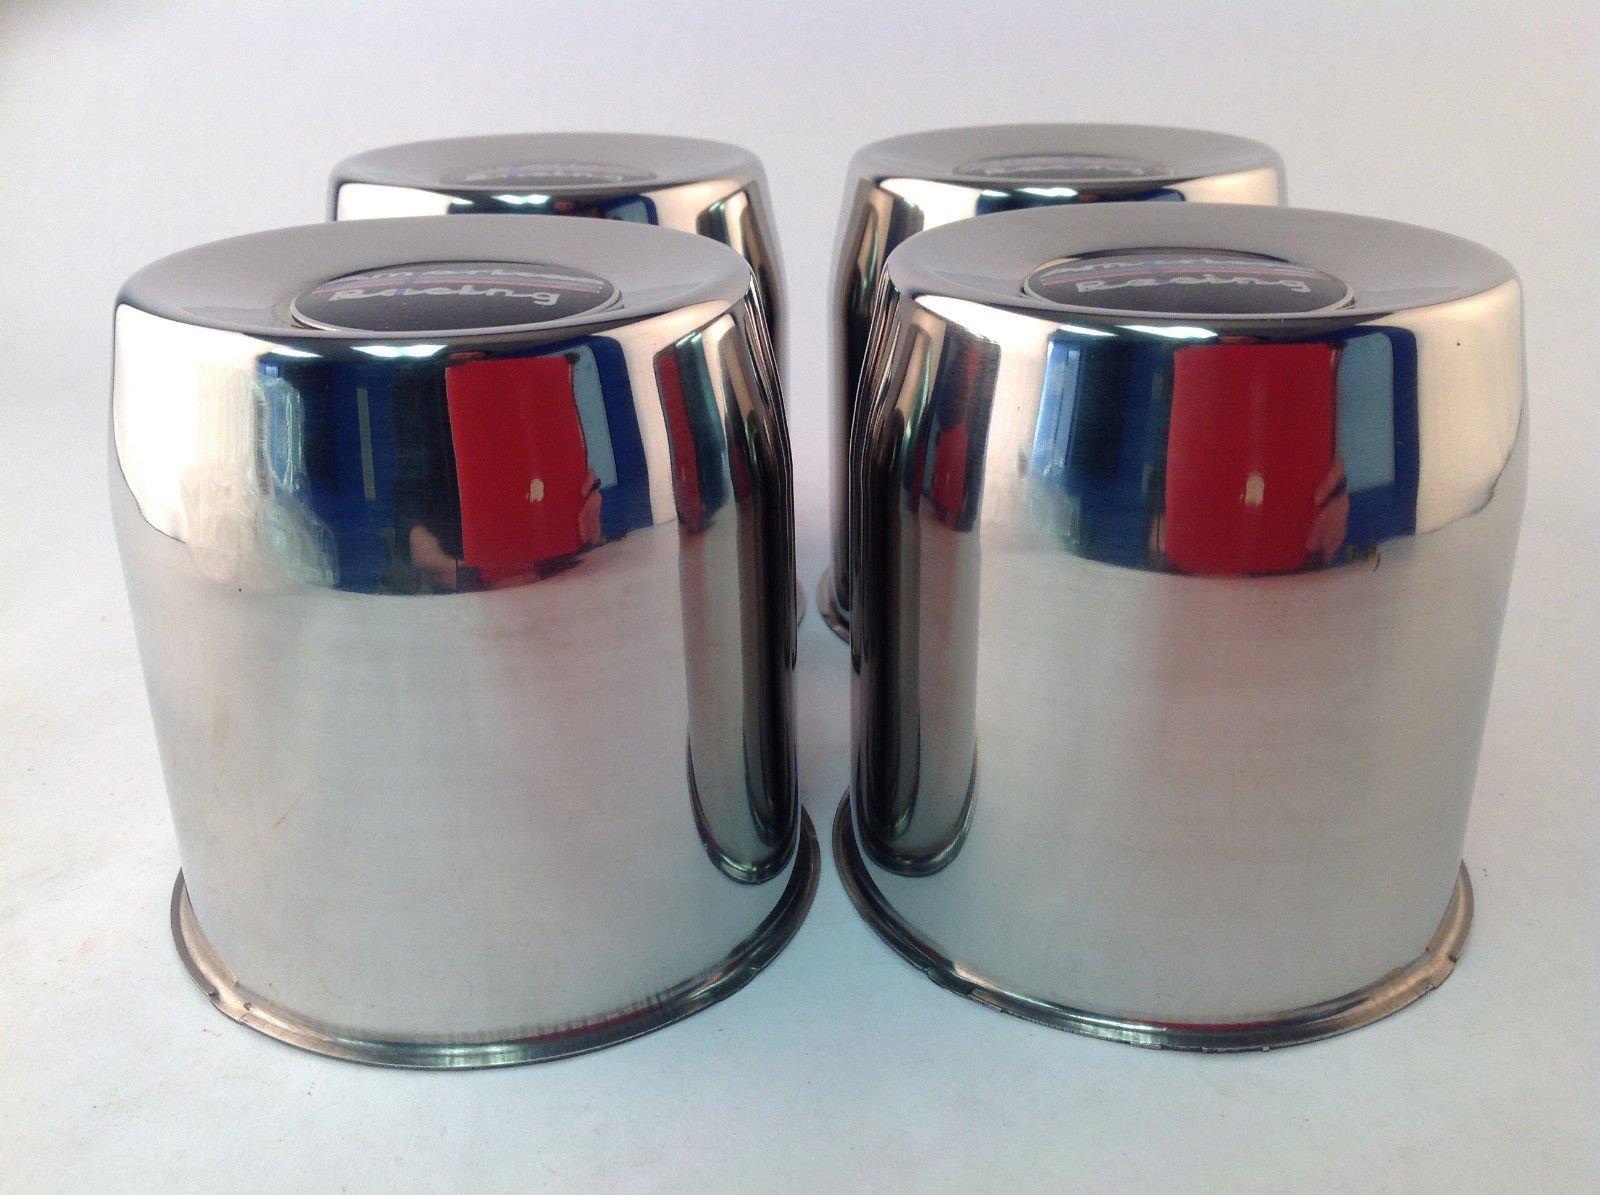 American-Racing-1425002SS-Stainless-Steel-Push-Thru-Center-Cap-Wheel-Caps-425